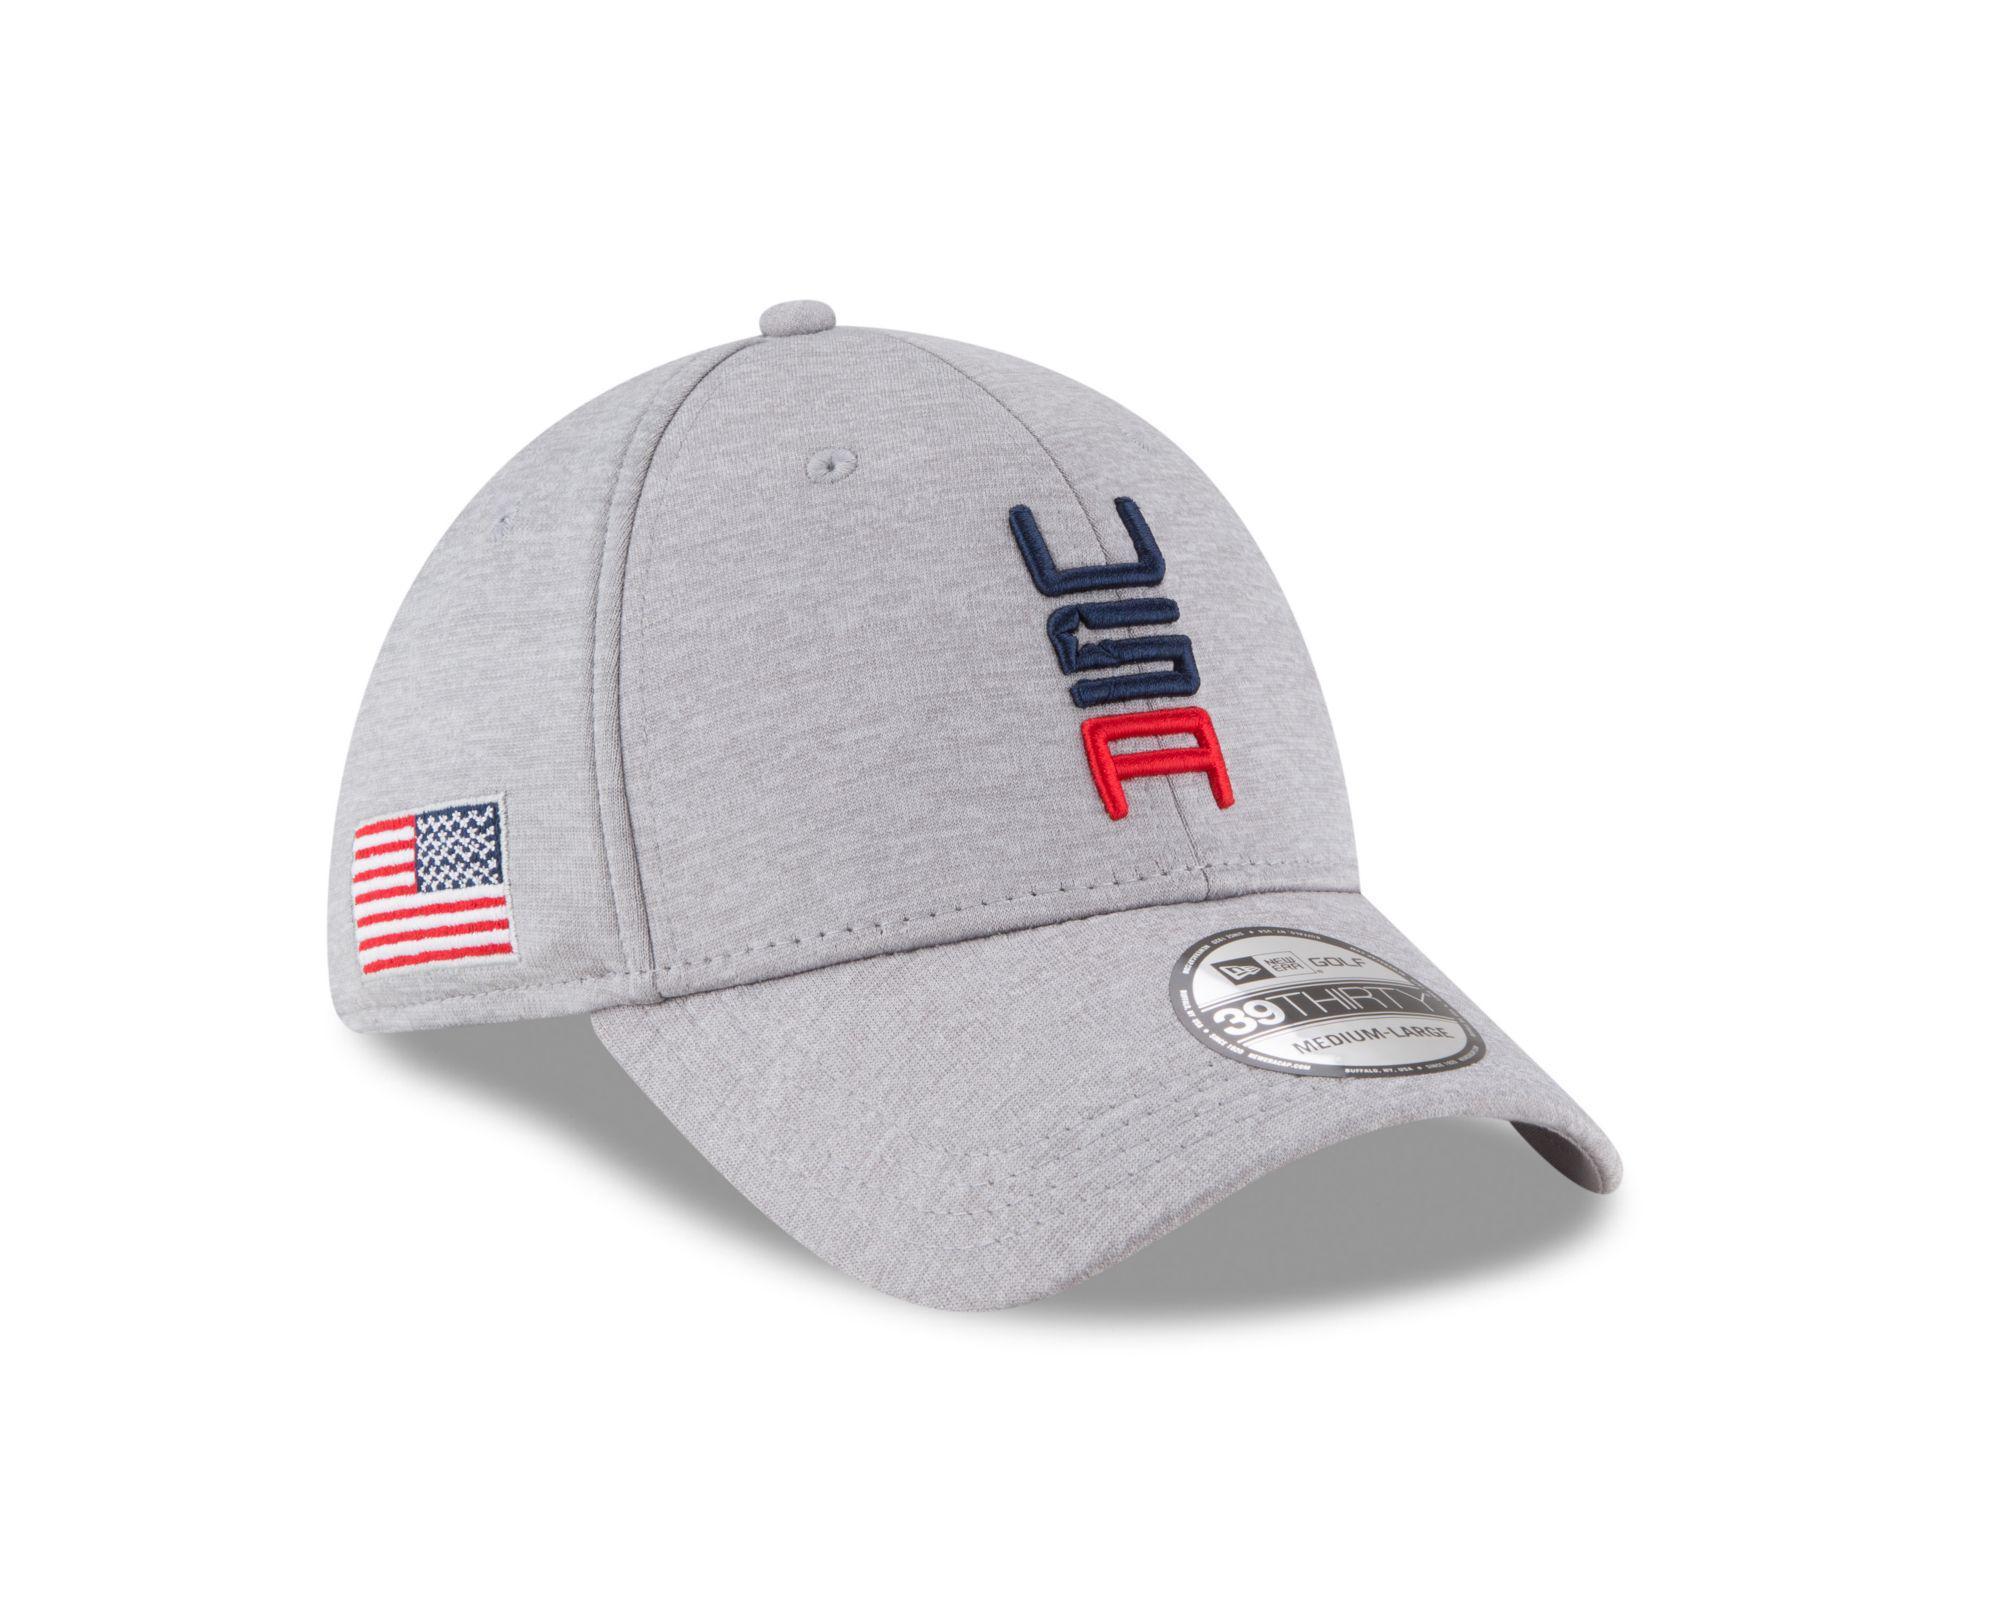 6b46ea7dde6 Lyst - KTZ Usa Friday 39thirty Golf Hat in Gray for Men